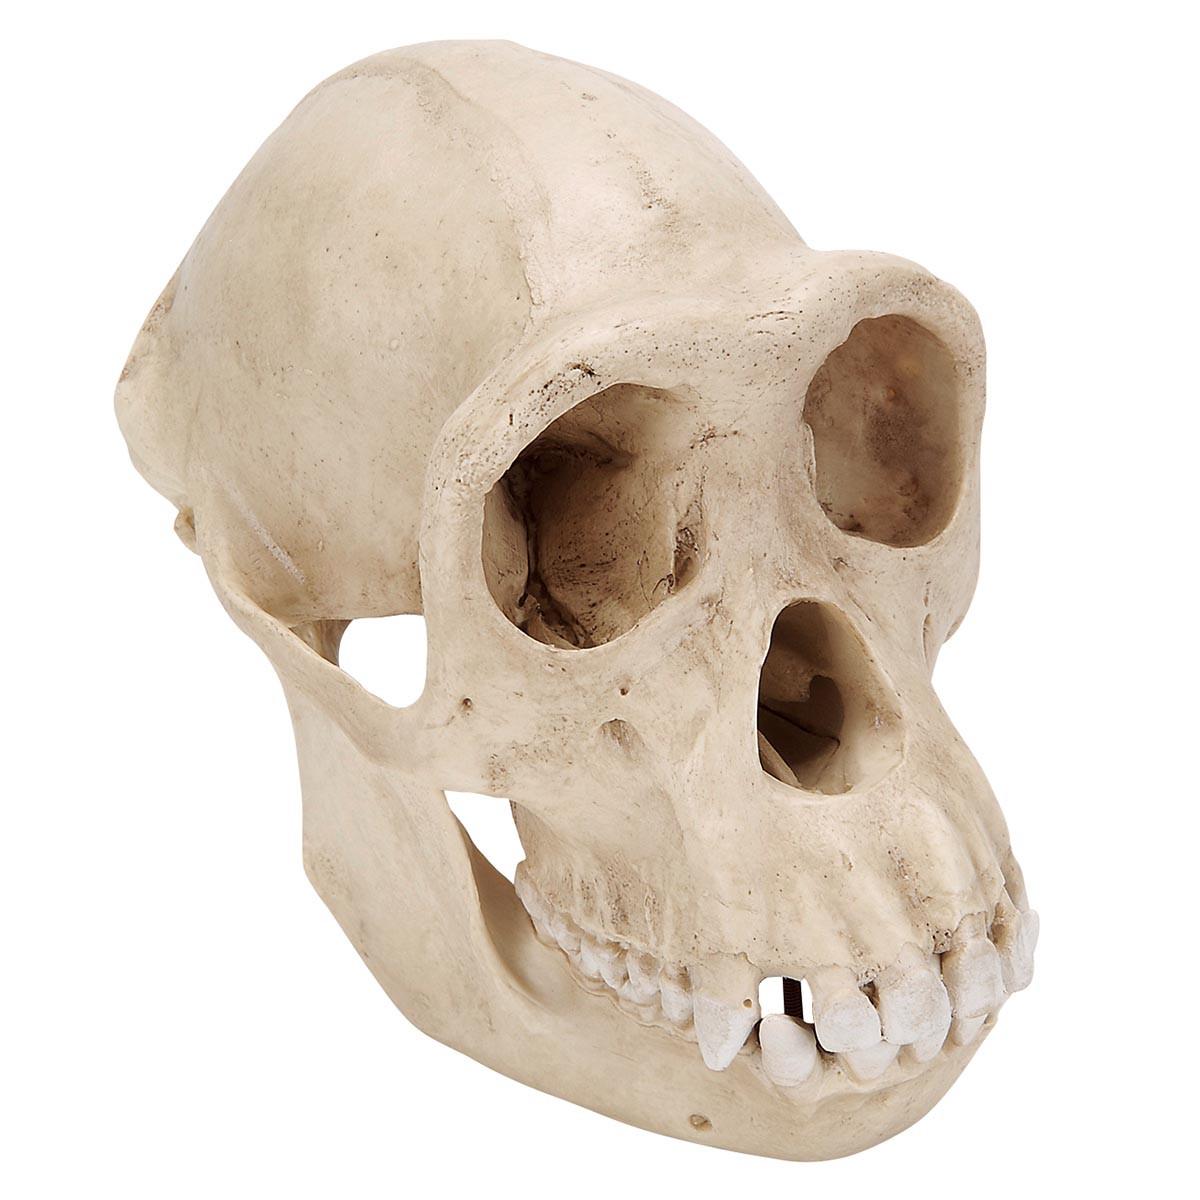 Модель черепа самки шимпанзе (Pantroglodytes)